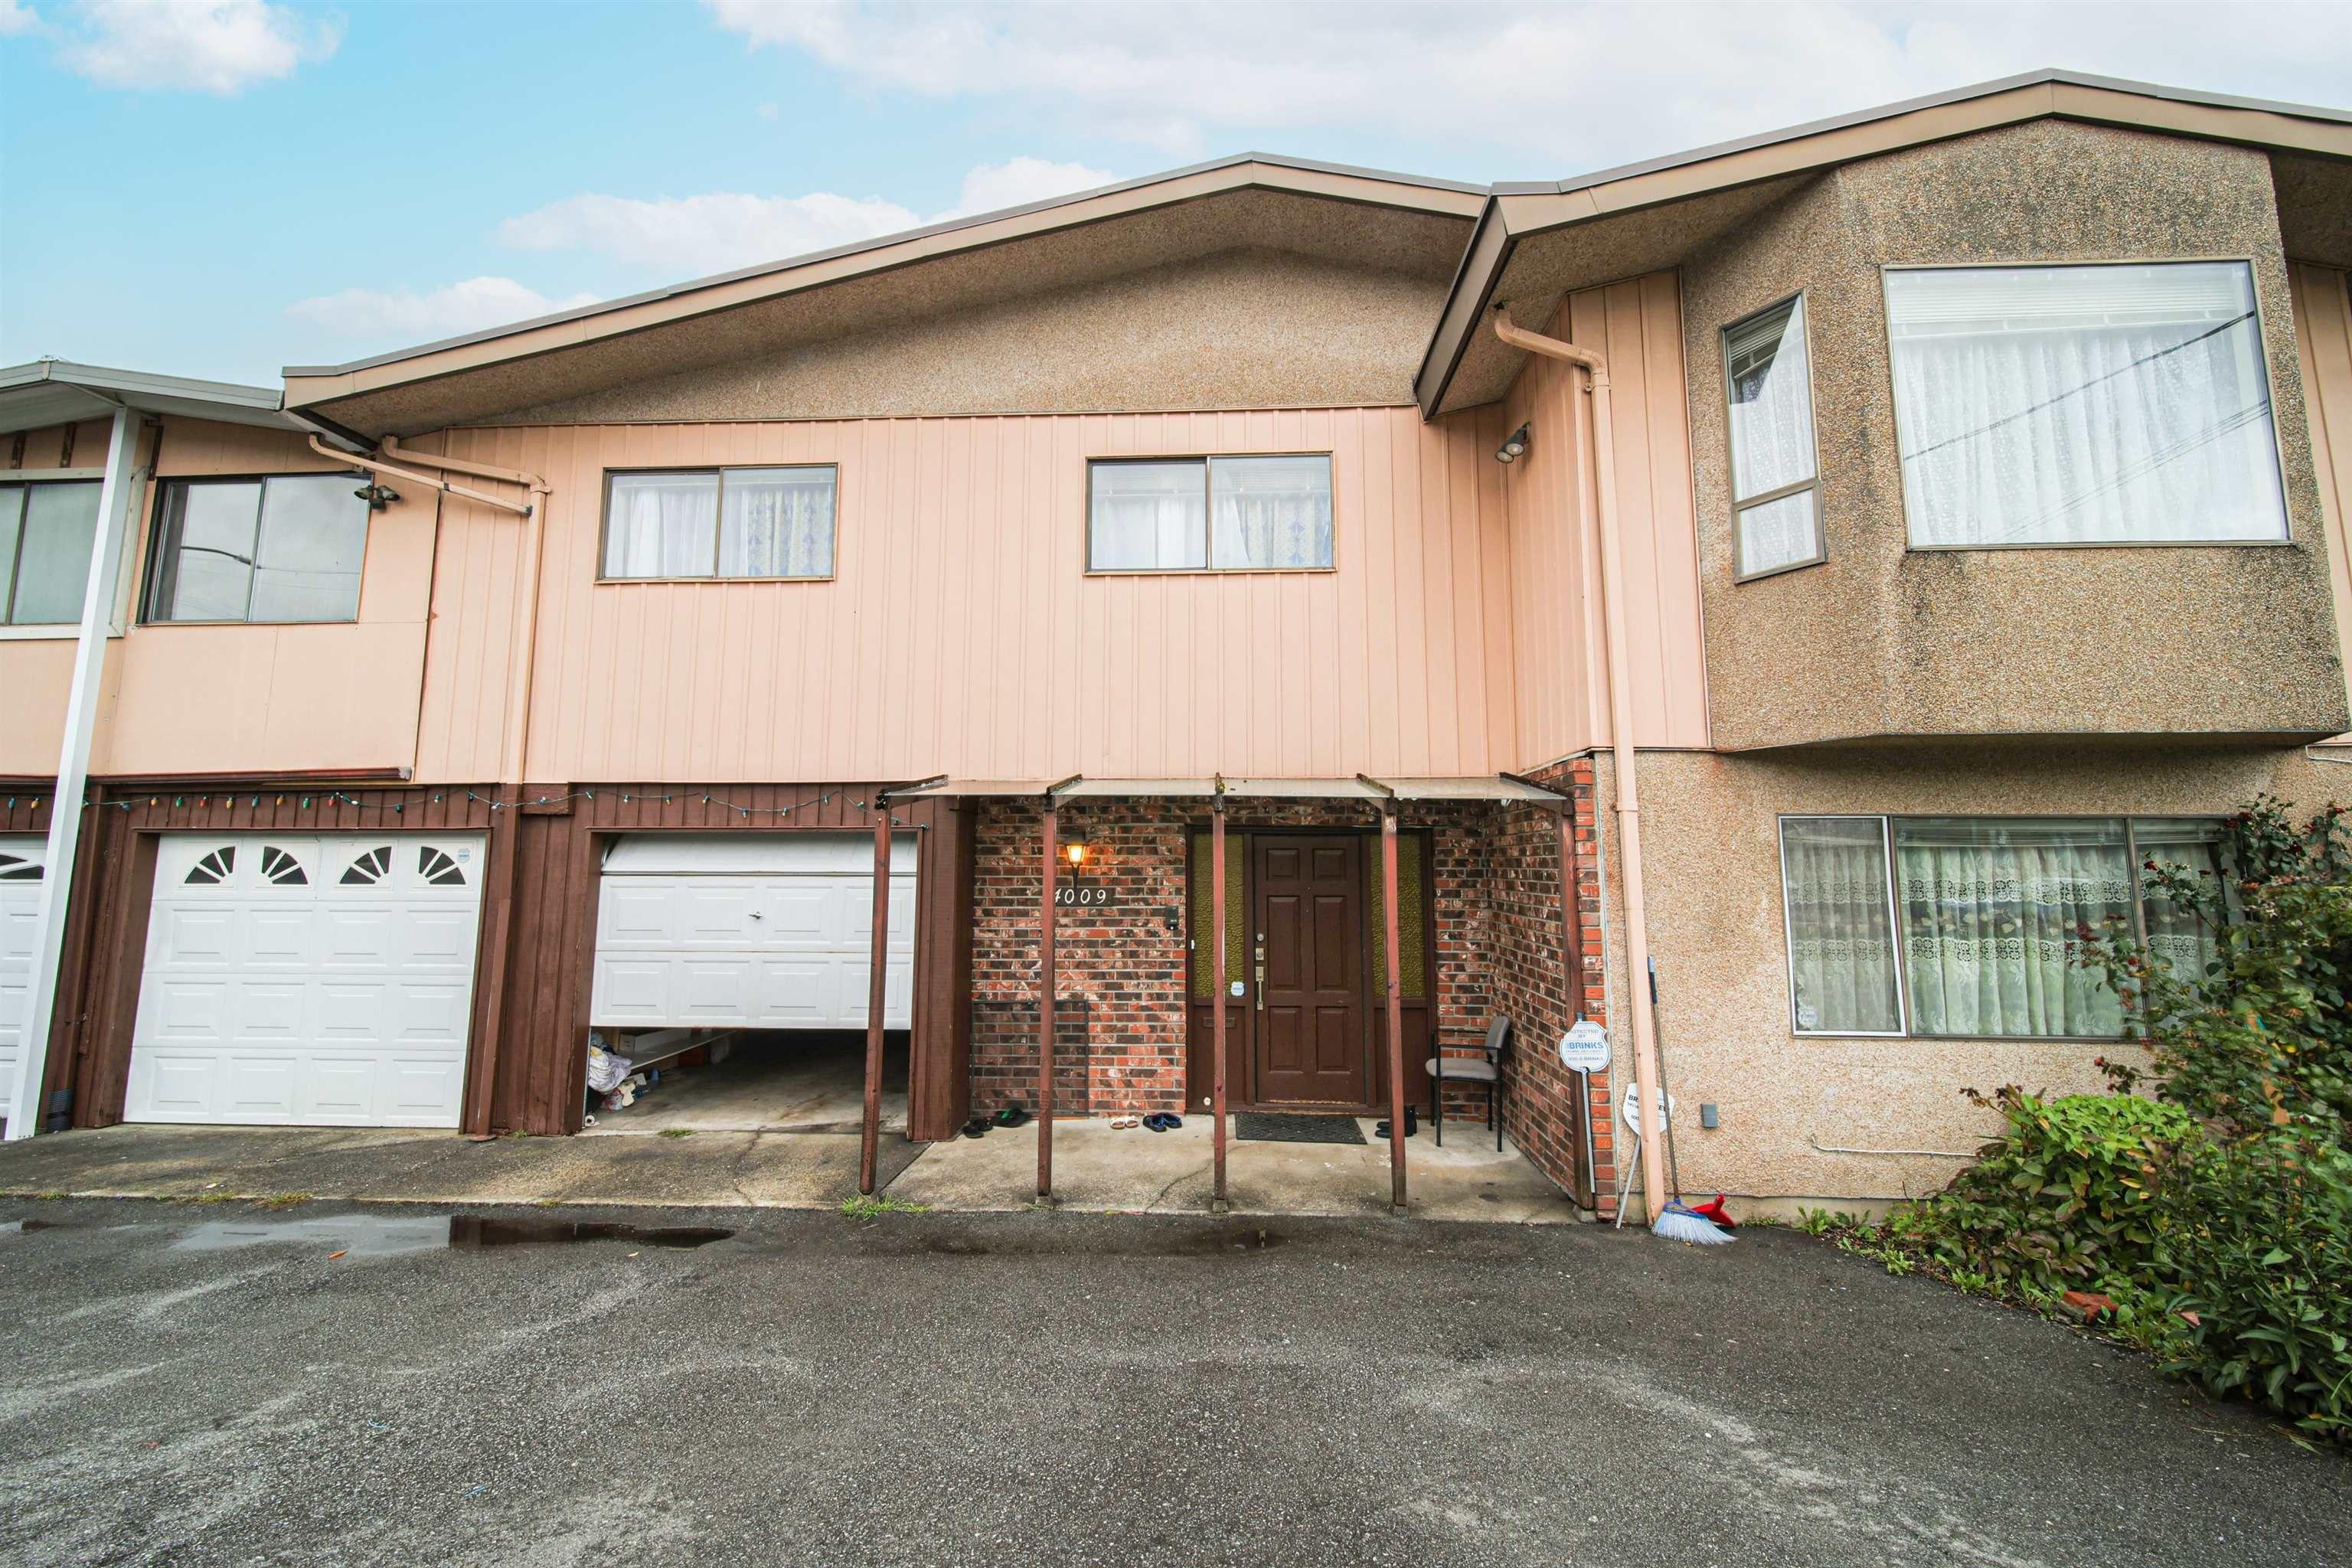 Main Photo: 4009 PRICE Street in Burnaby: Garden Village 1/2 Duplex for sale (Burnaby South)  : MLS®# R2621878